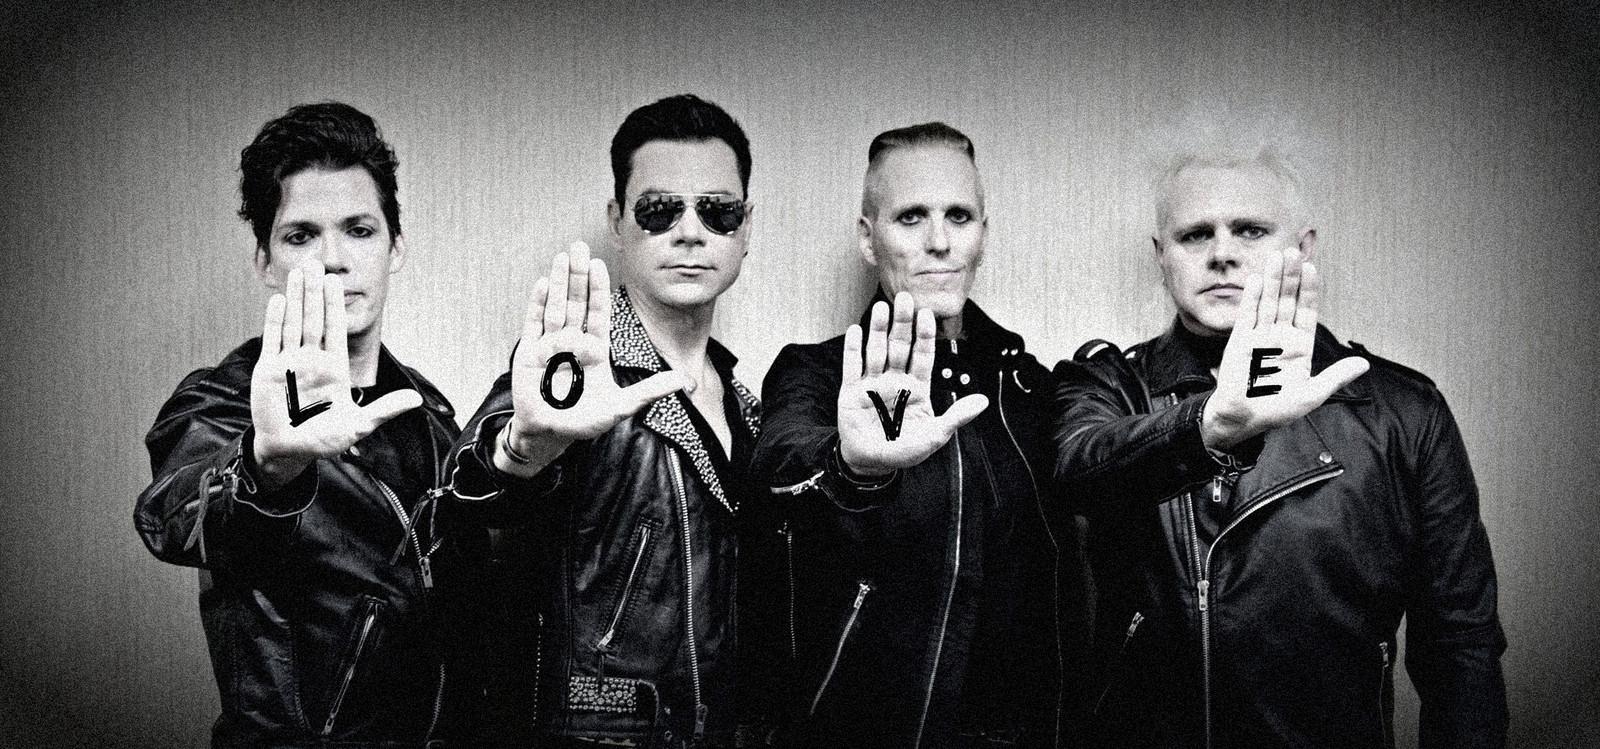 depeche mode tribute uk - 1320×740